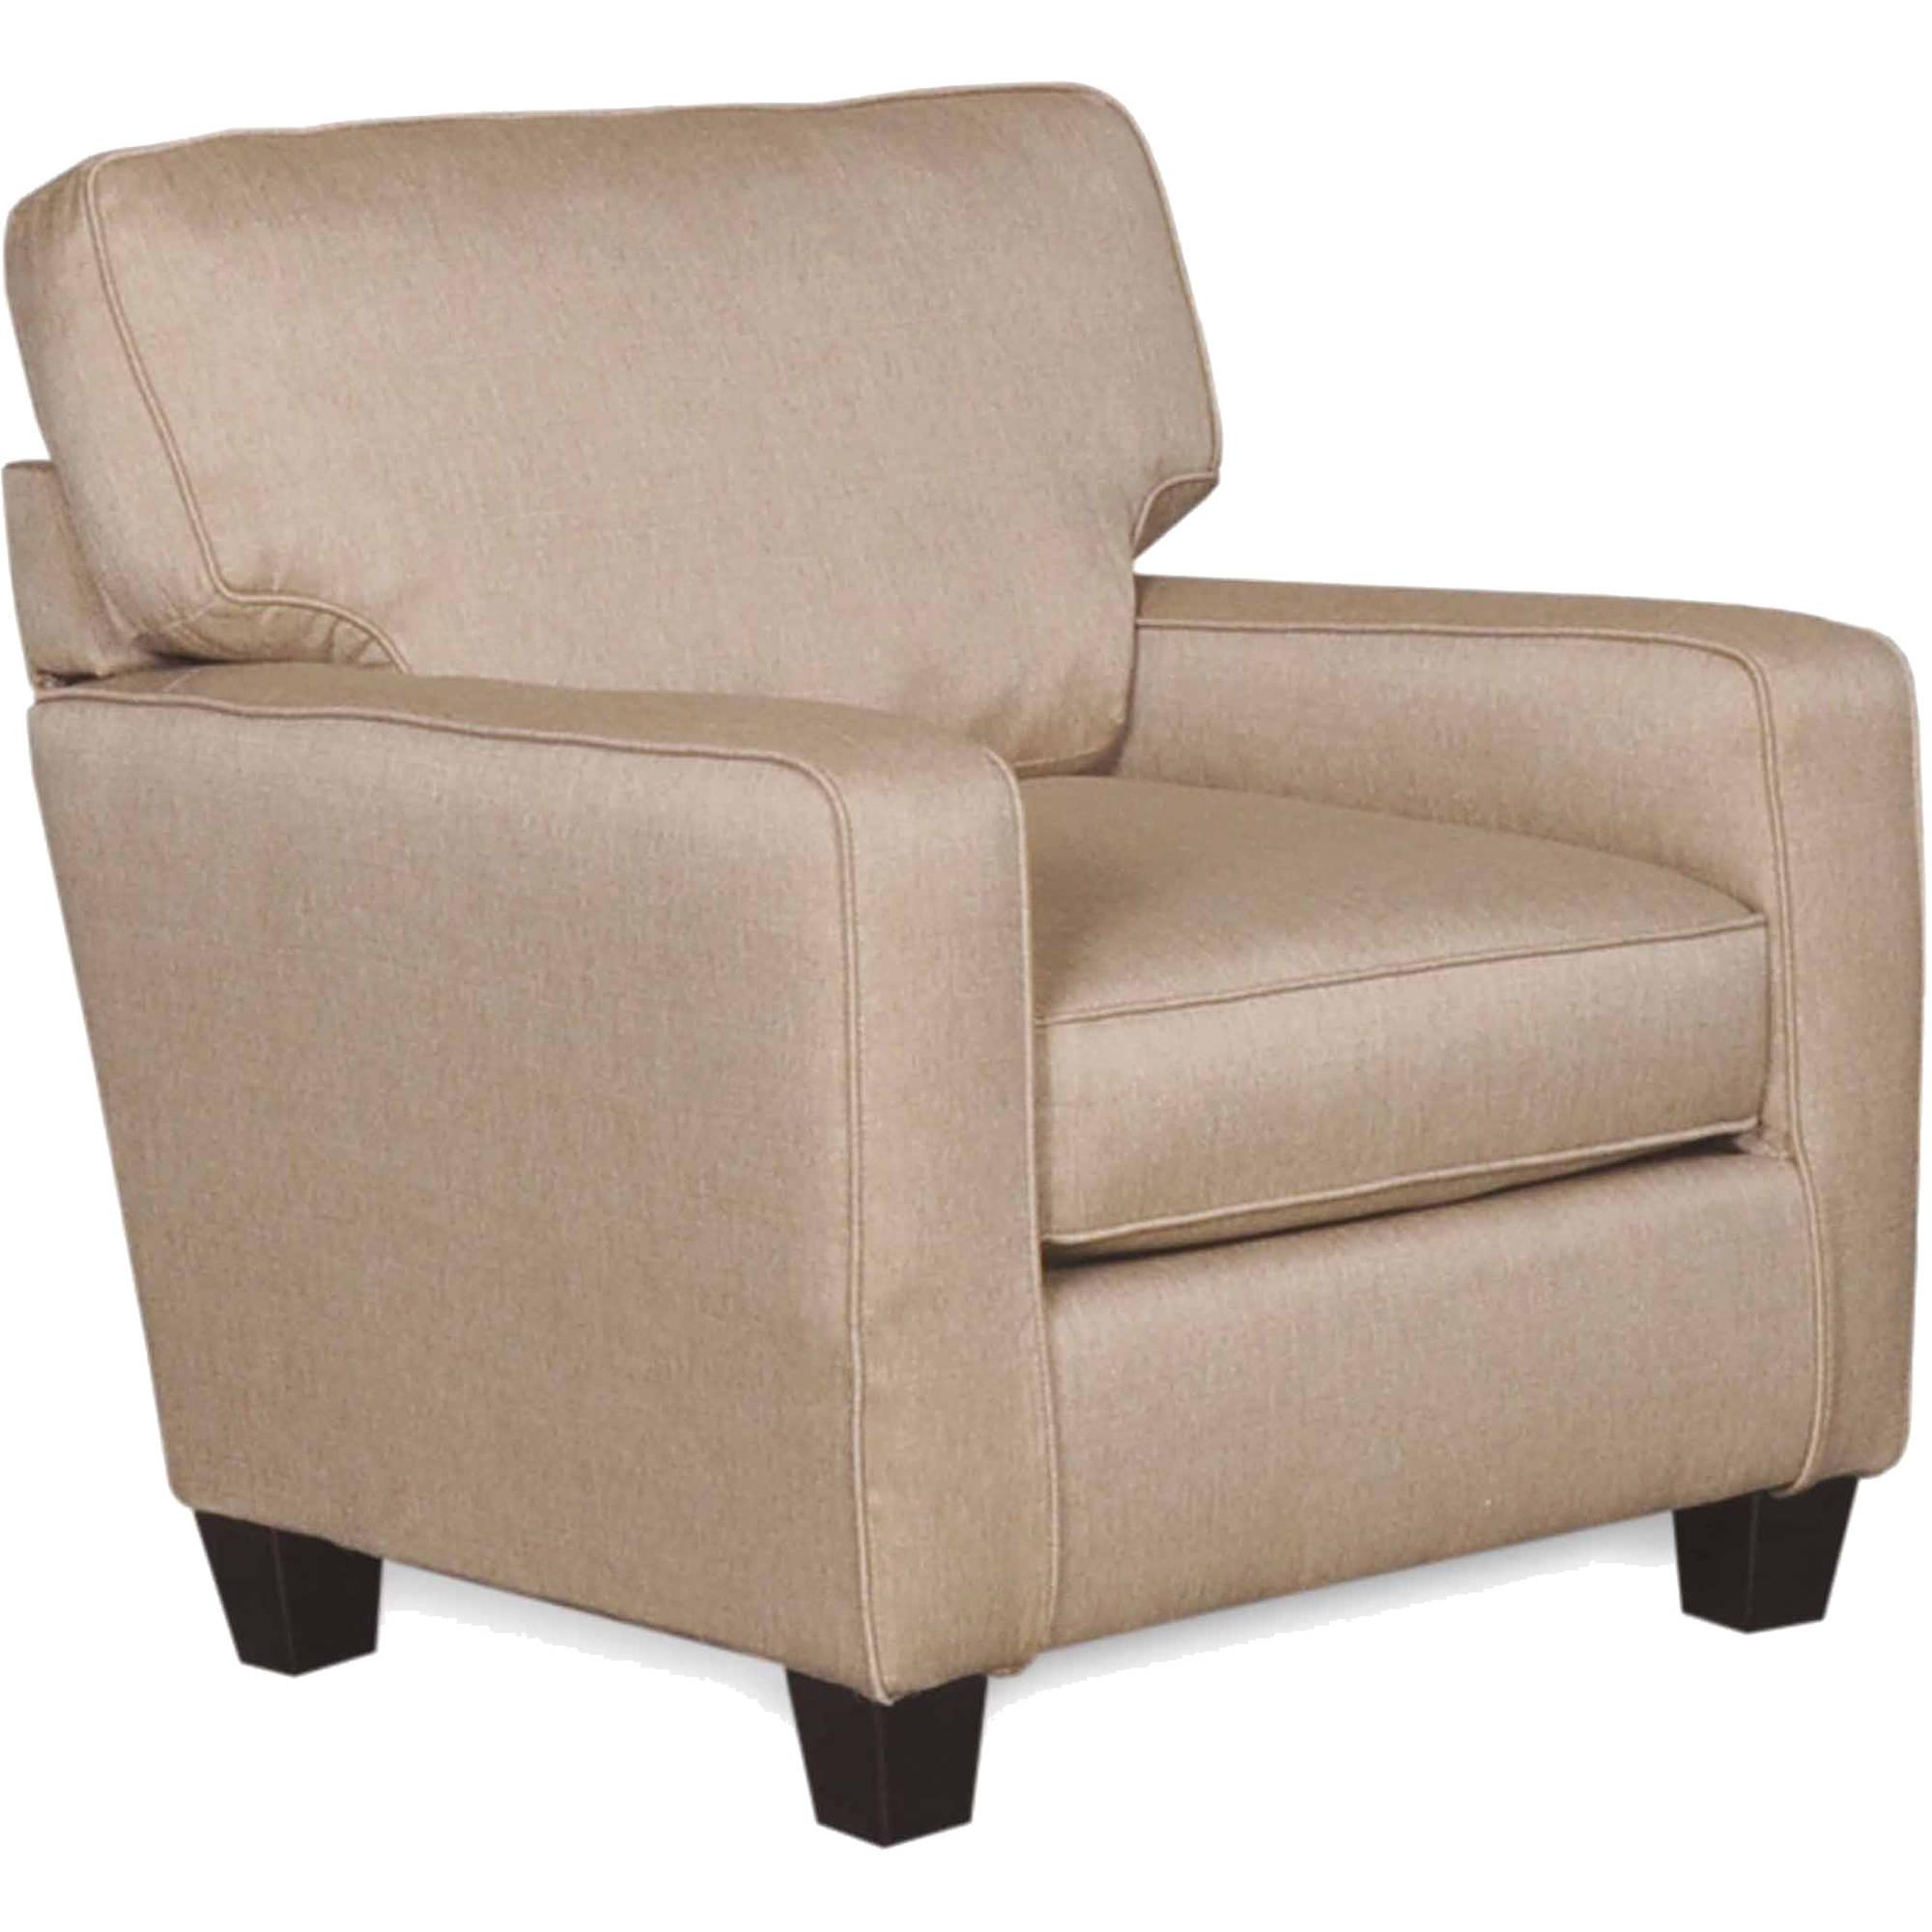 SoFab Darcey Beige Chair